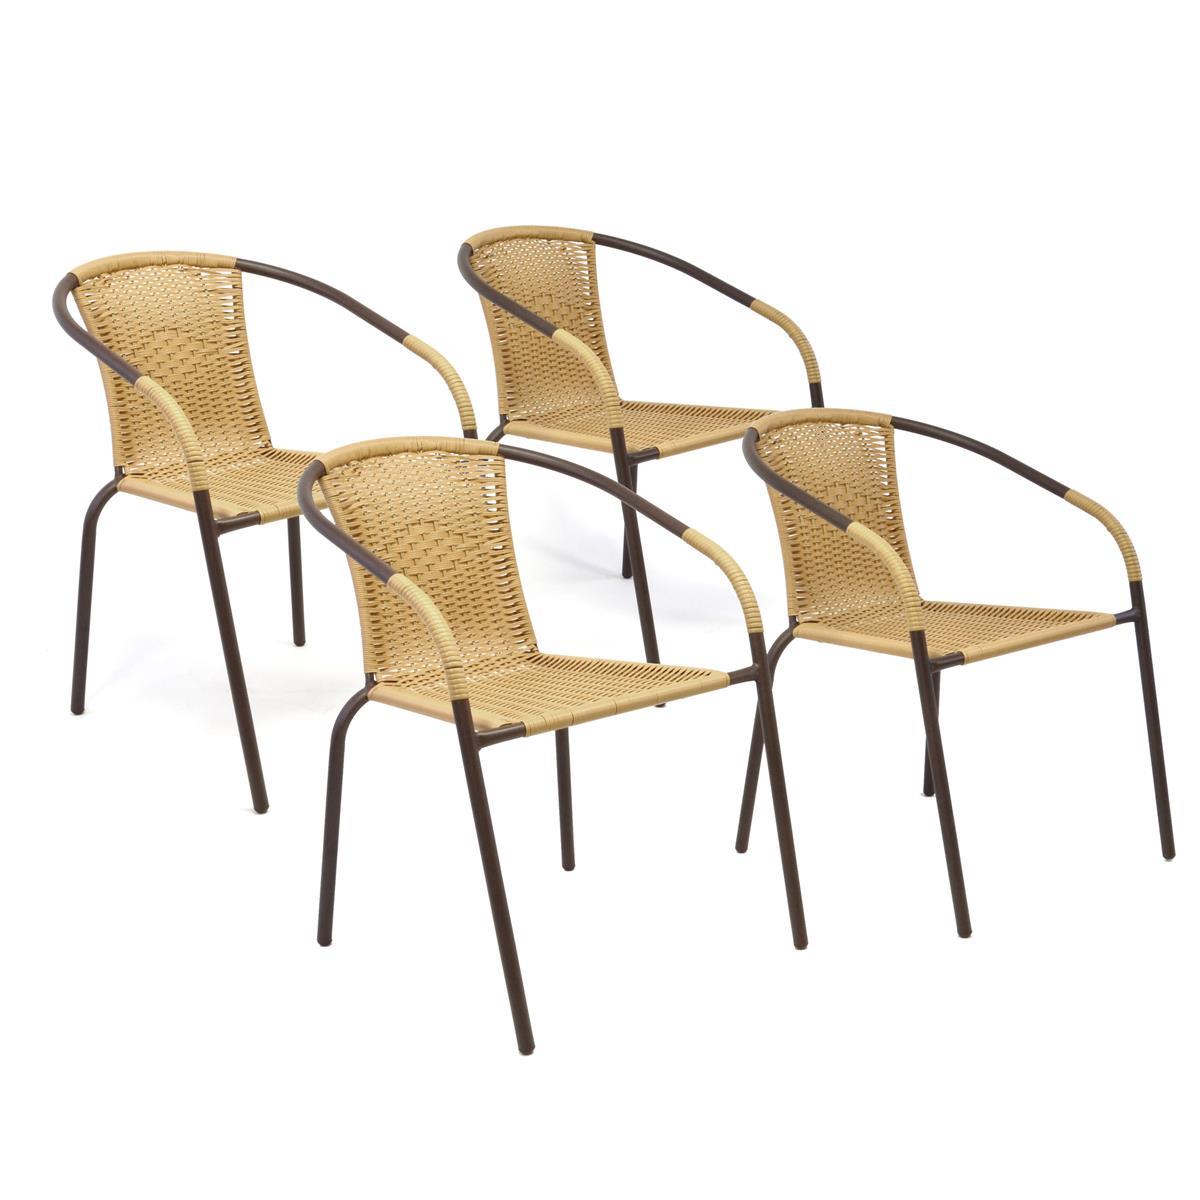 4er Set Bistrostuhl beige Stapelstuhl Balkonstuhl Gartenstuhl Poly-Rattan Stahl